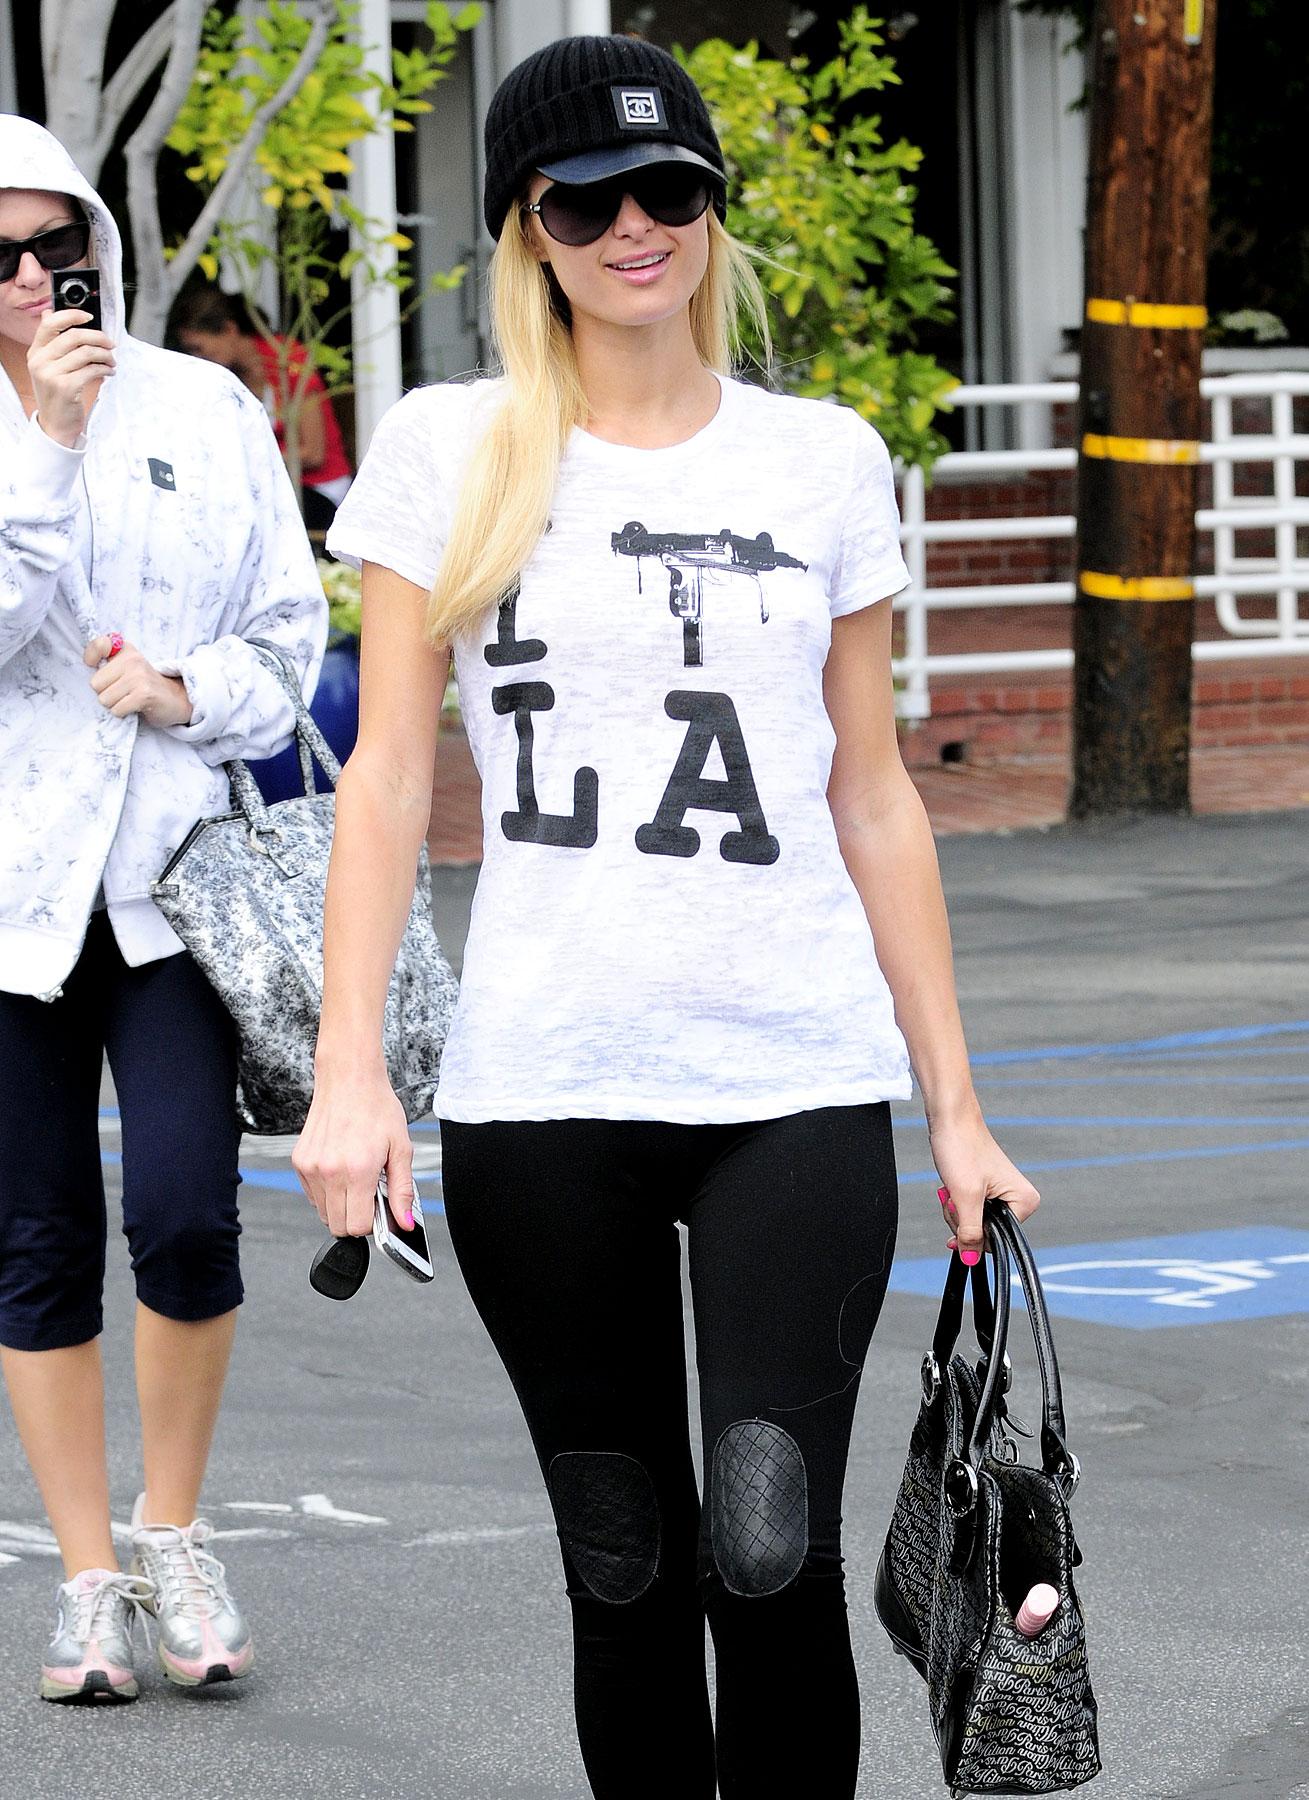 Paris Hilton Has Mixed Feelings About LA (PHOTOS)